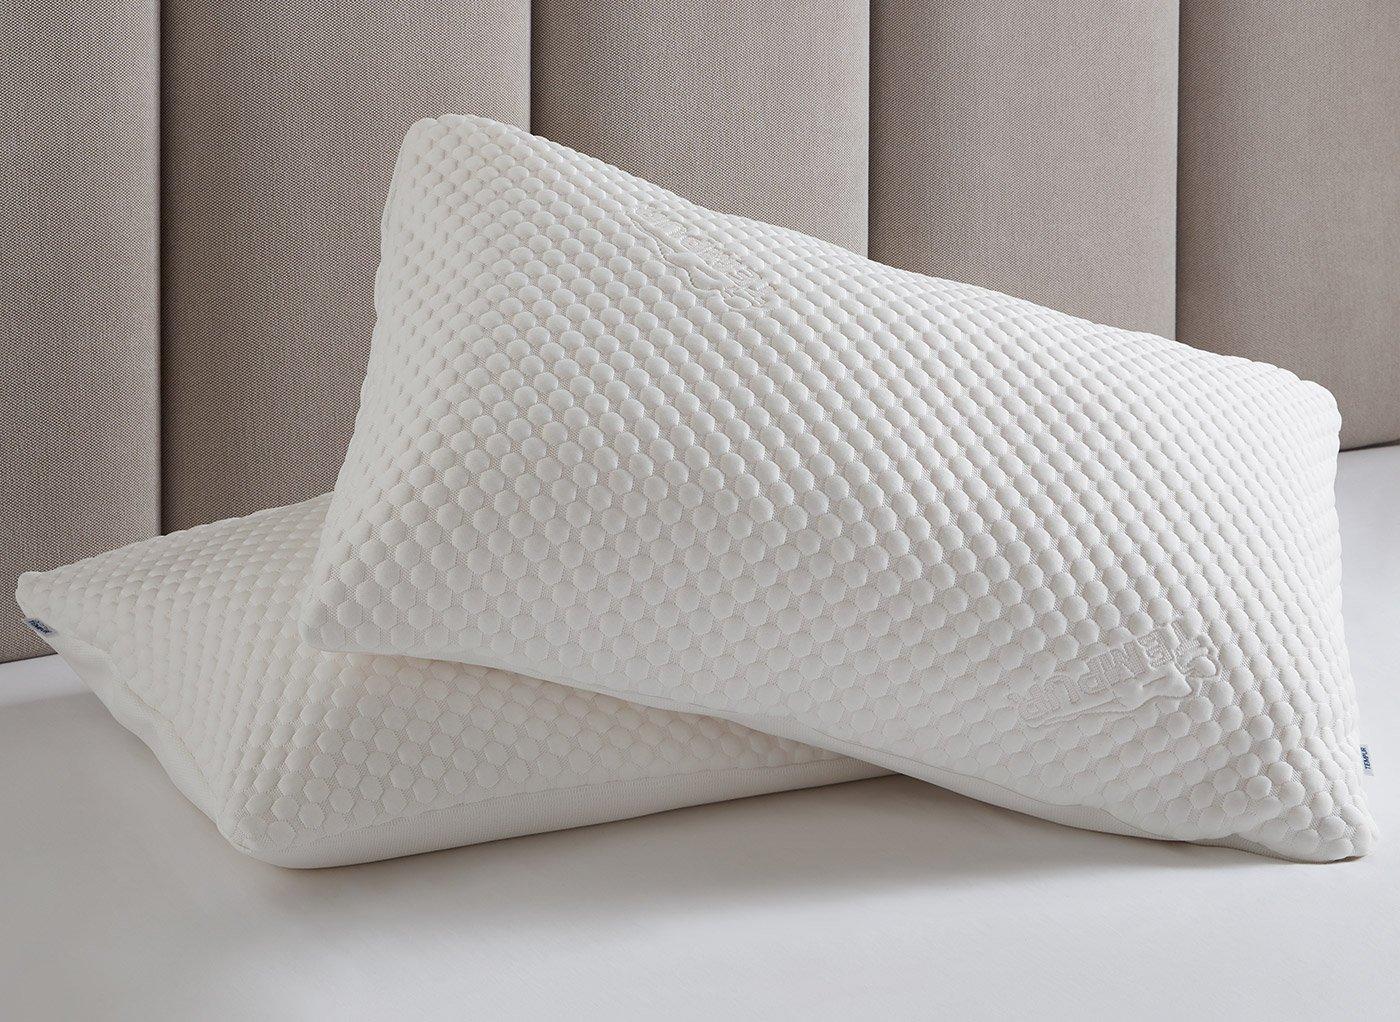 TEMPUR-Cloud Pillow的圖片搜尋結果